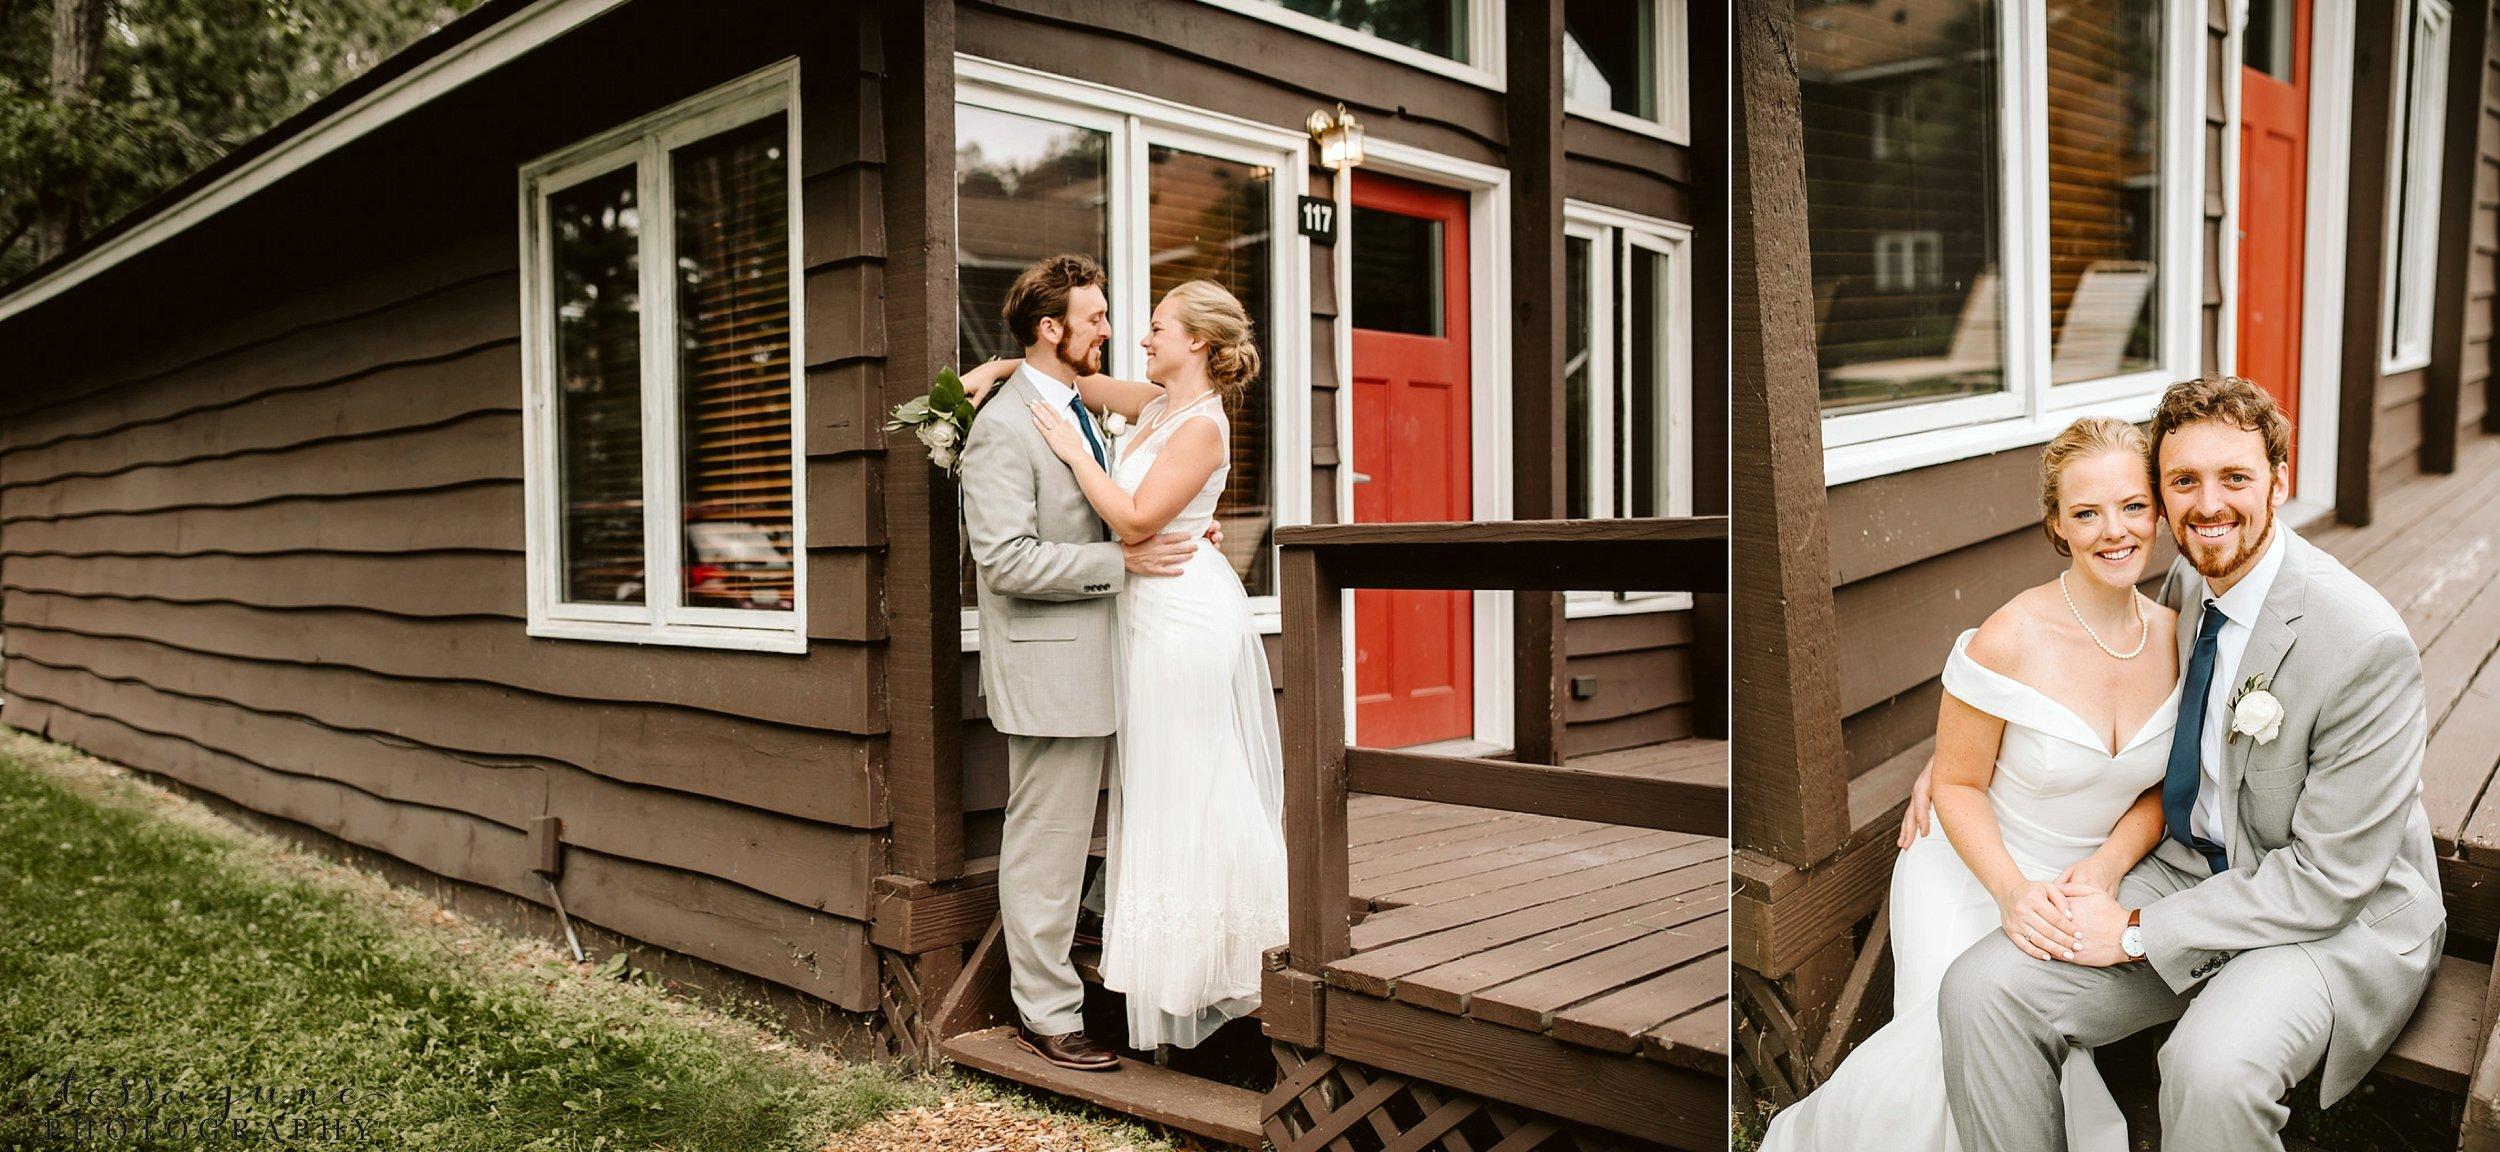 grandview-lodge-wedding-nisswa-minnesota-cabin-bride-and-groom